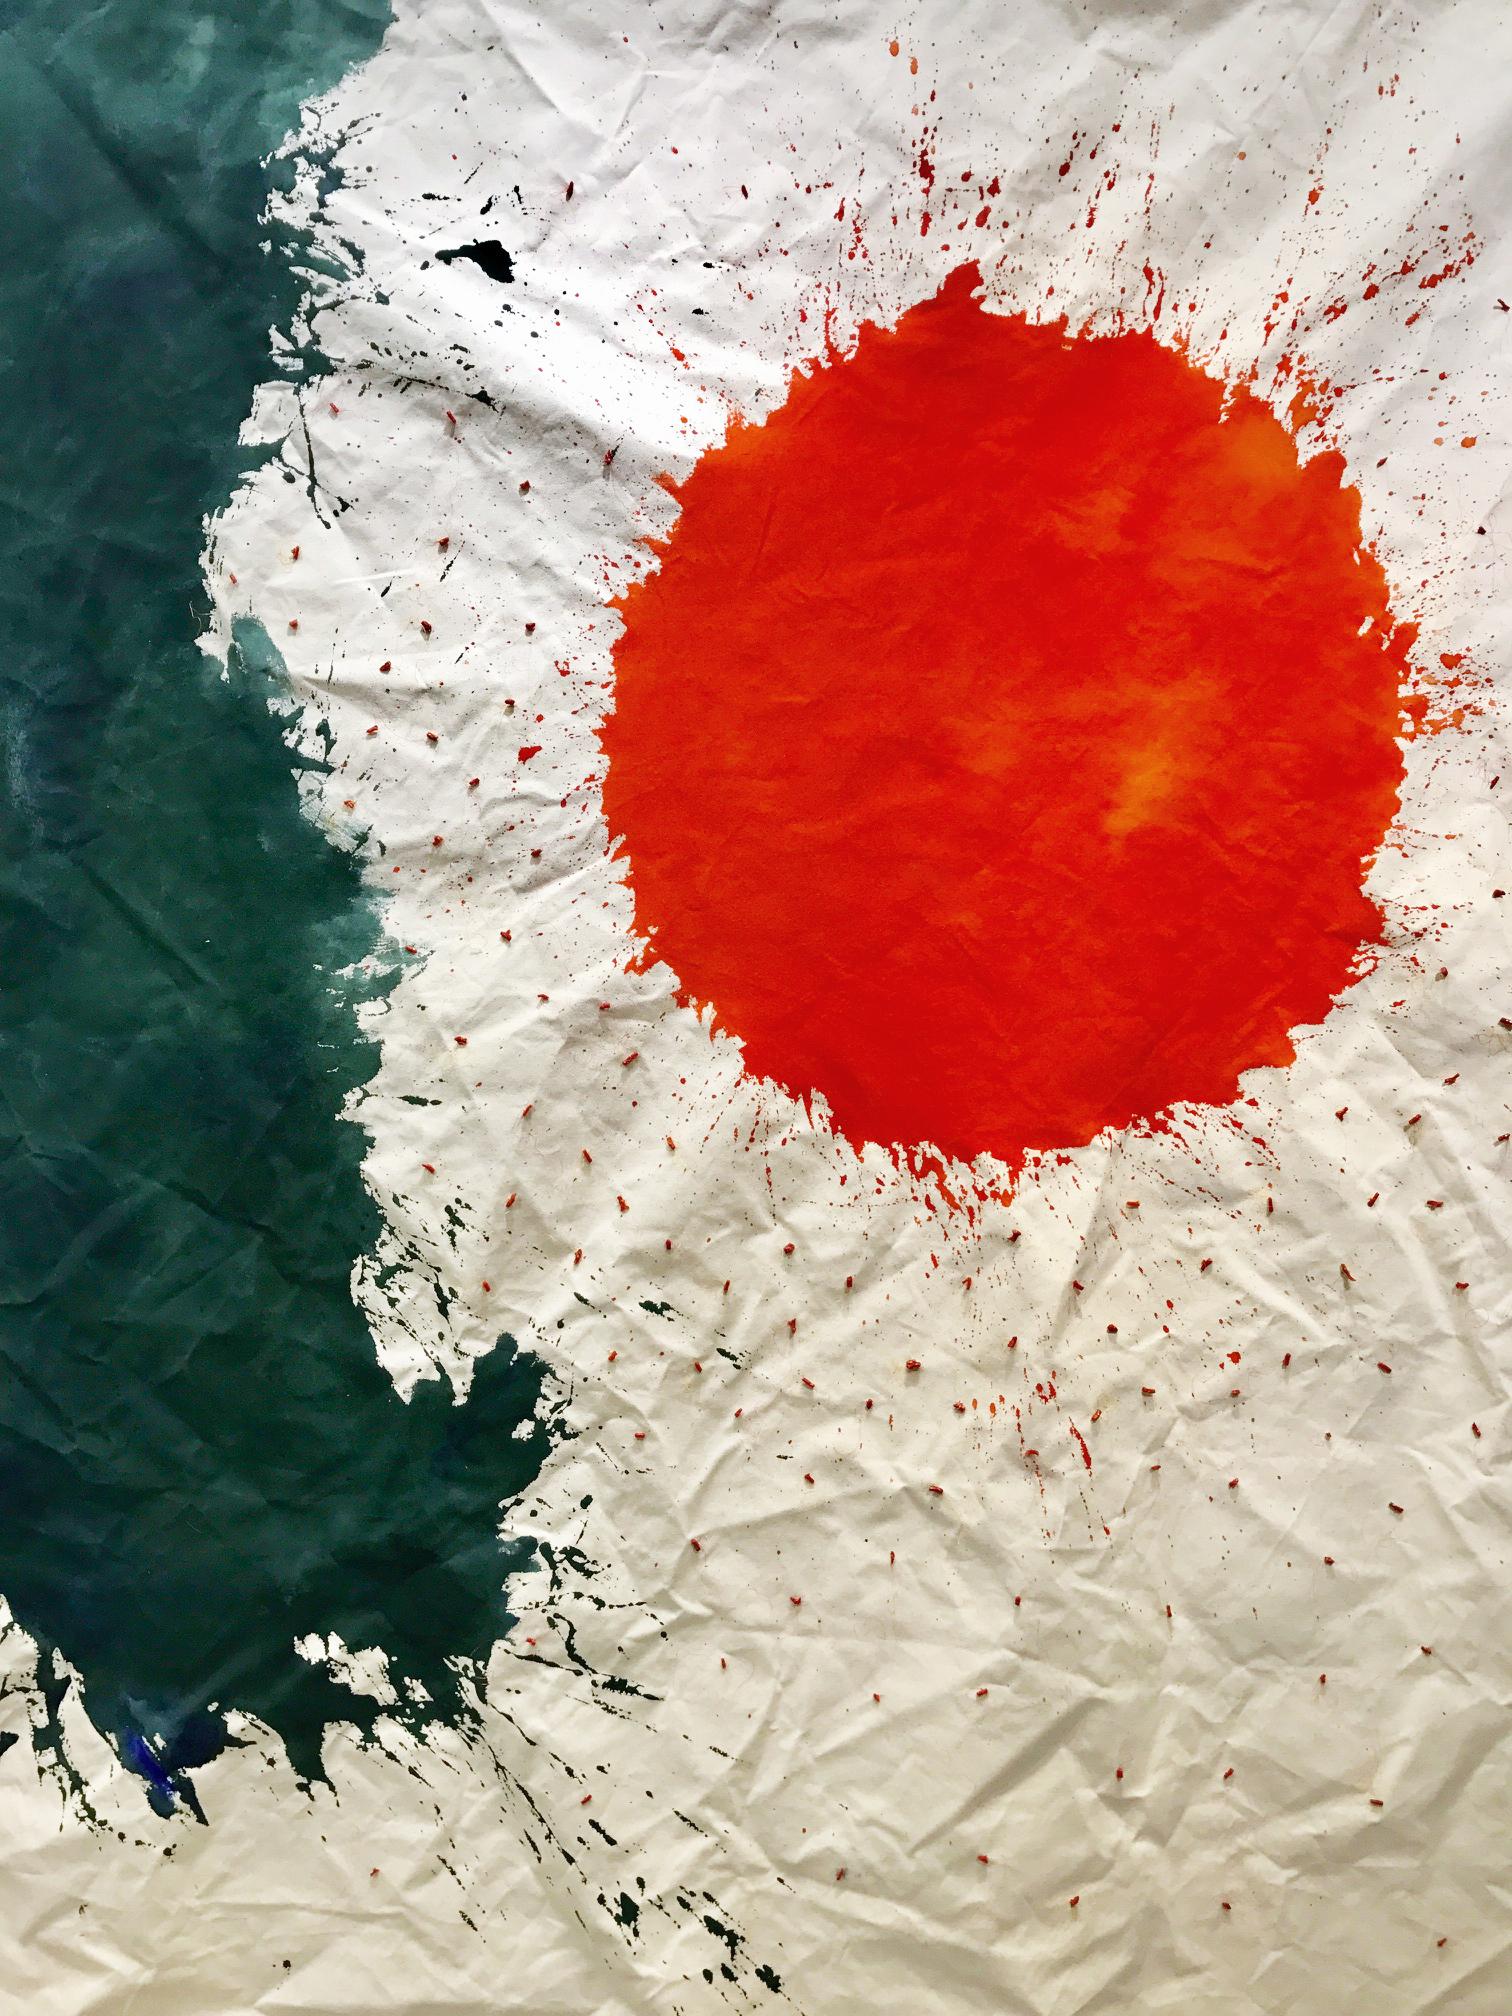 〈大紅珊瑚 A Big Red Coral〉,2018,